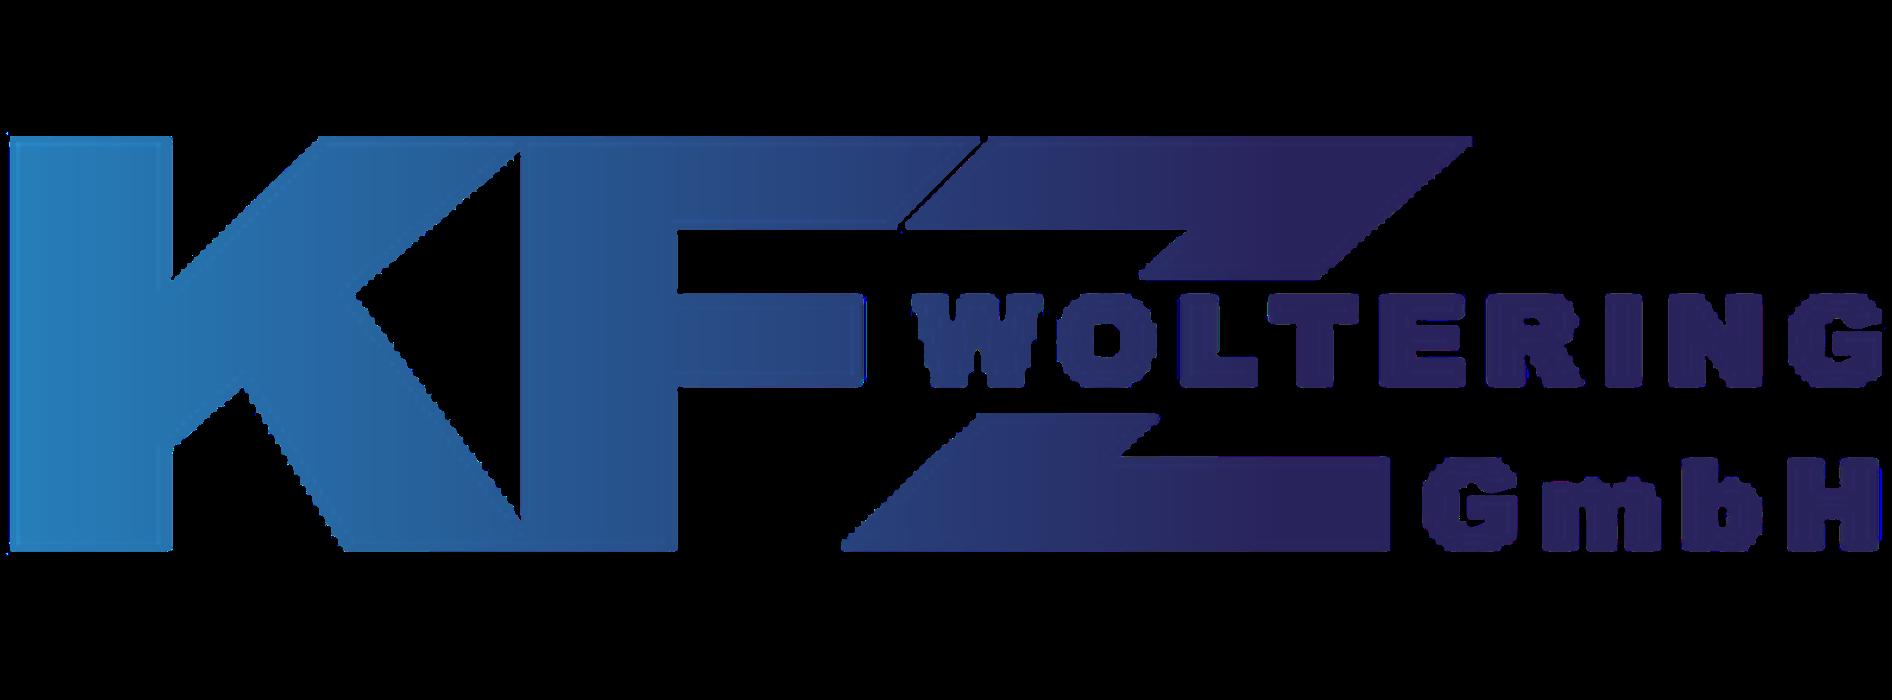 Bild zu KFZ-Woltering GmbH in Oer Erkenschwick